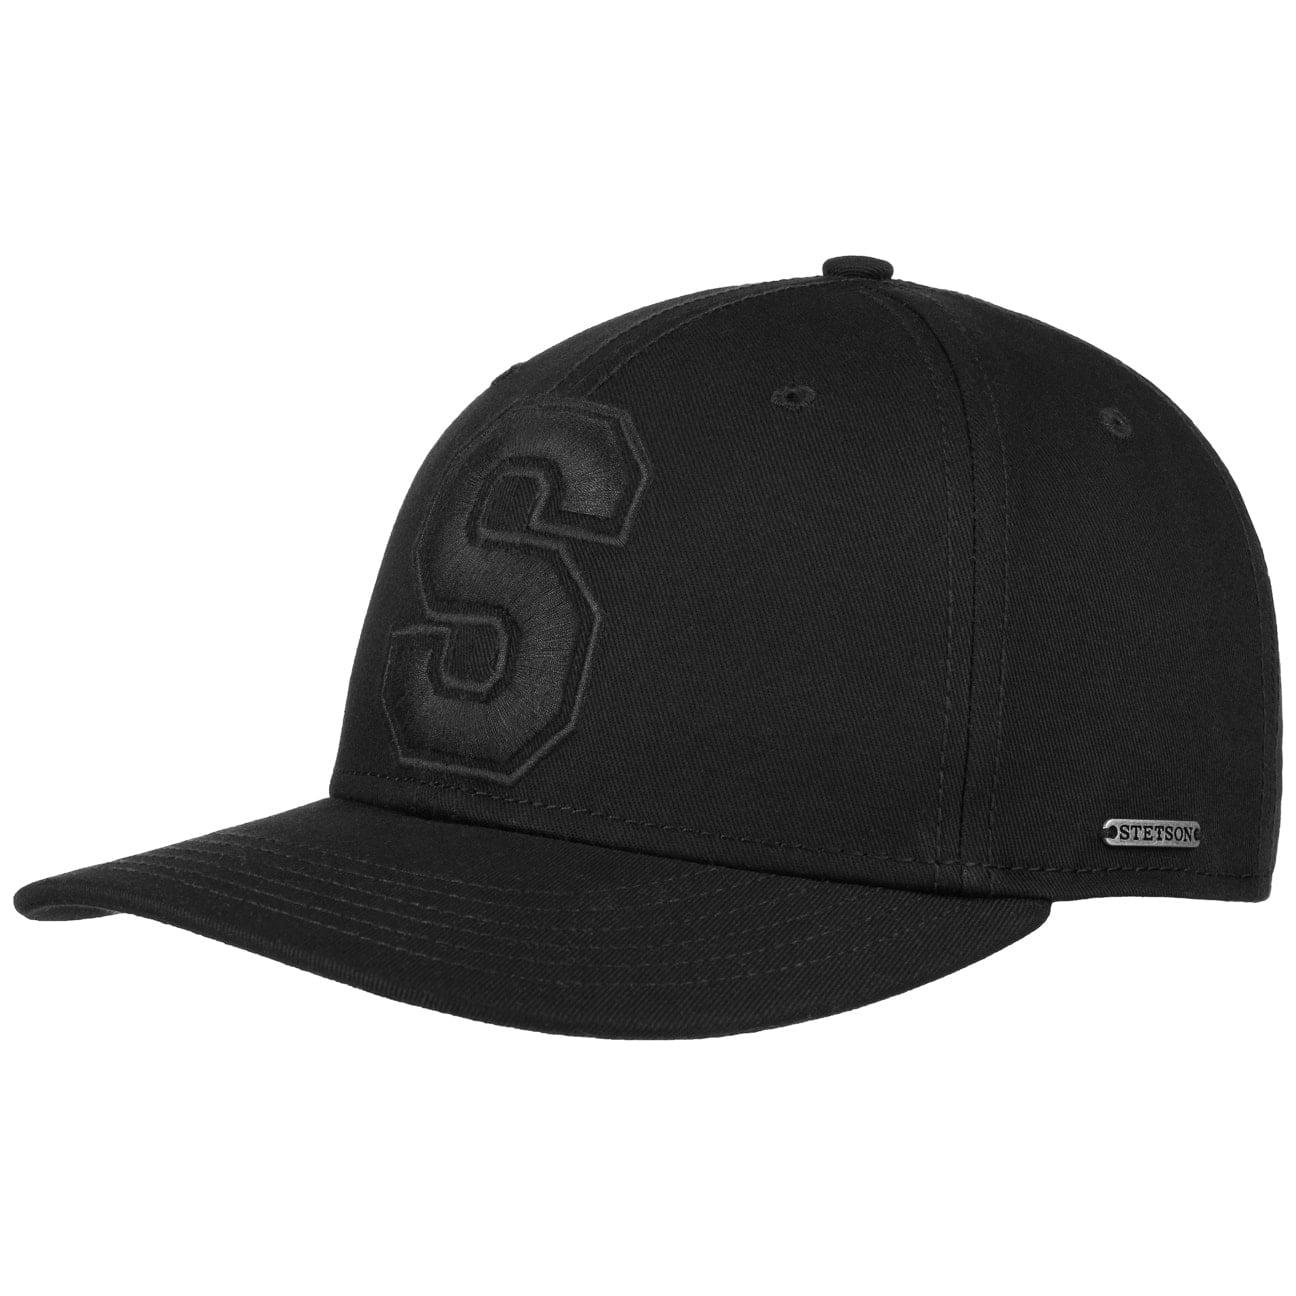 capital-s-cotton-baseballcap-by-stetson-basecap